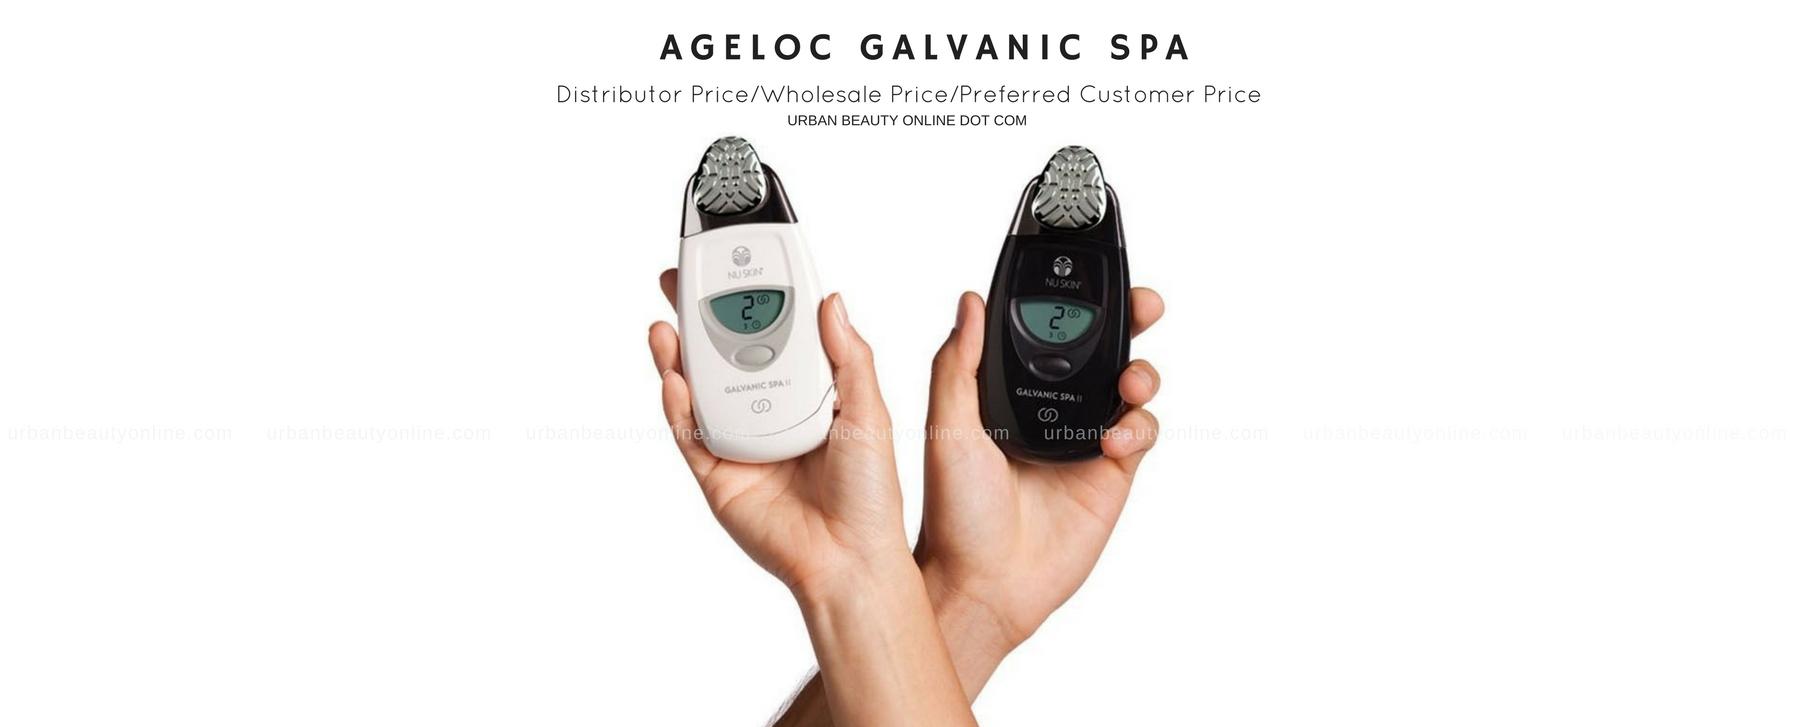 Galvanic_Black_White_Distributor_Wholesale_Price